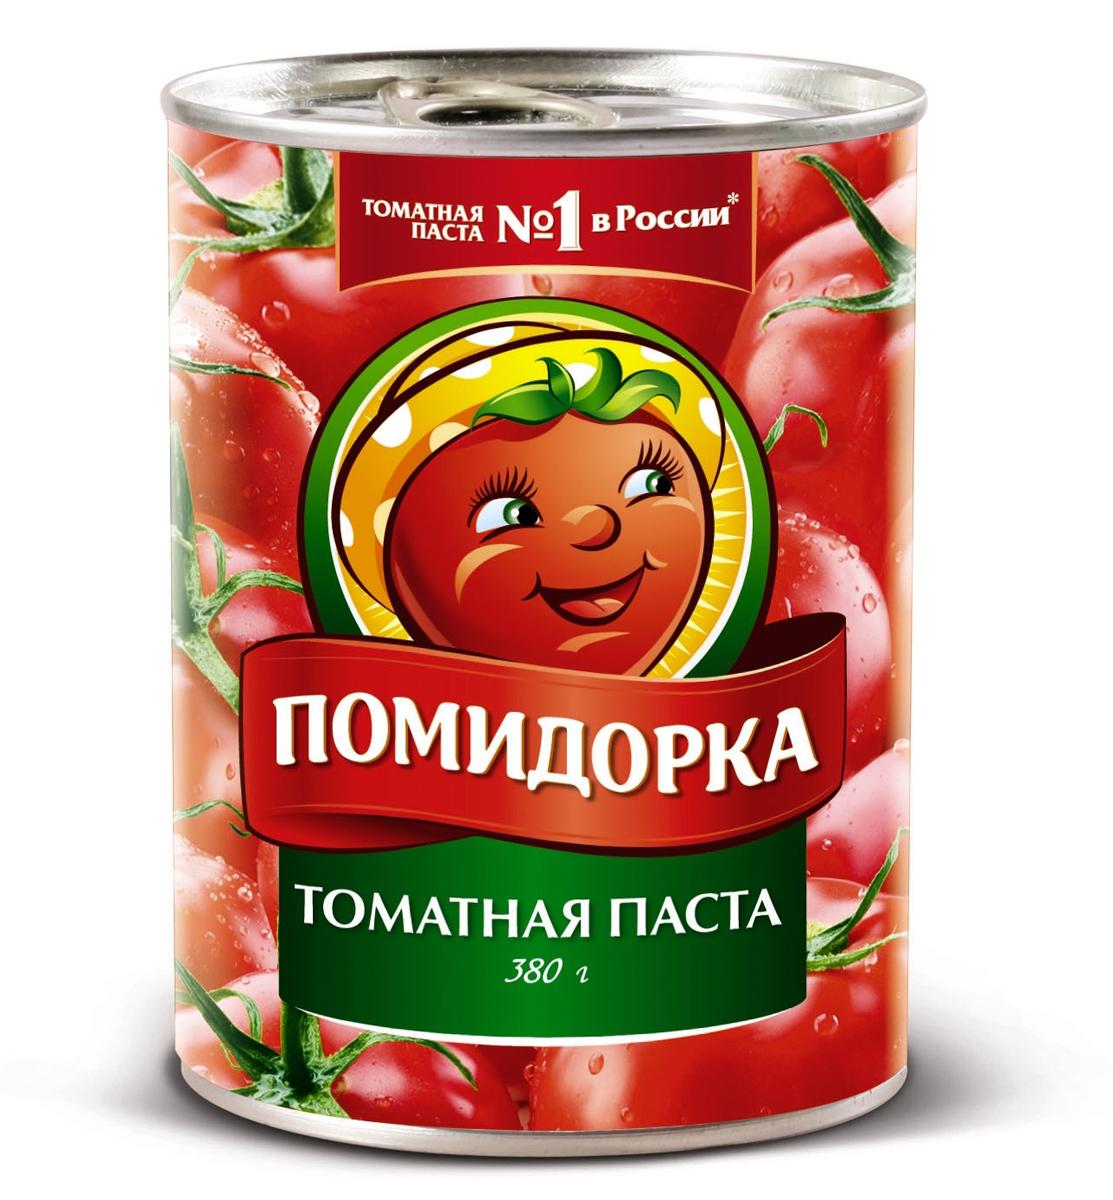 Помидорка Томатная паста, 380 г тони моли томатная